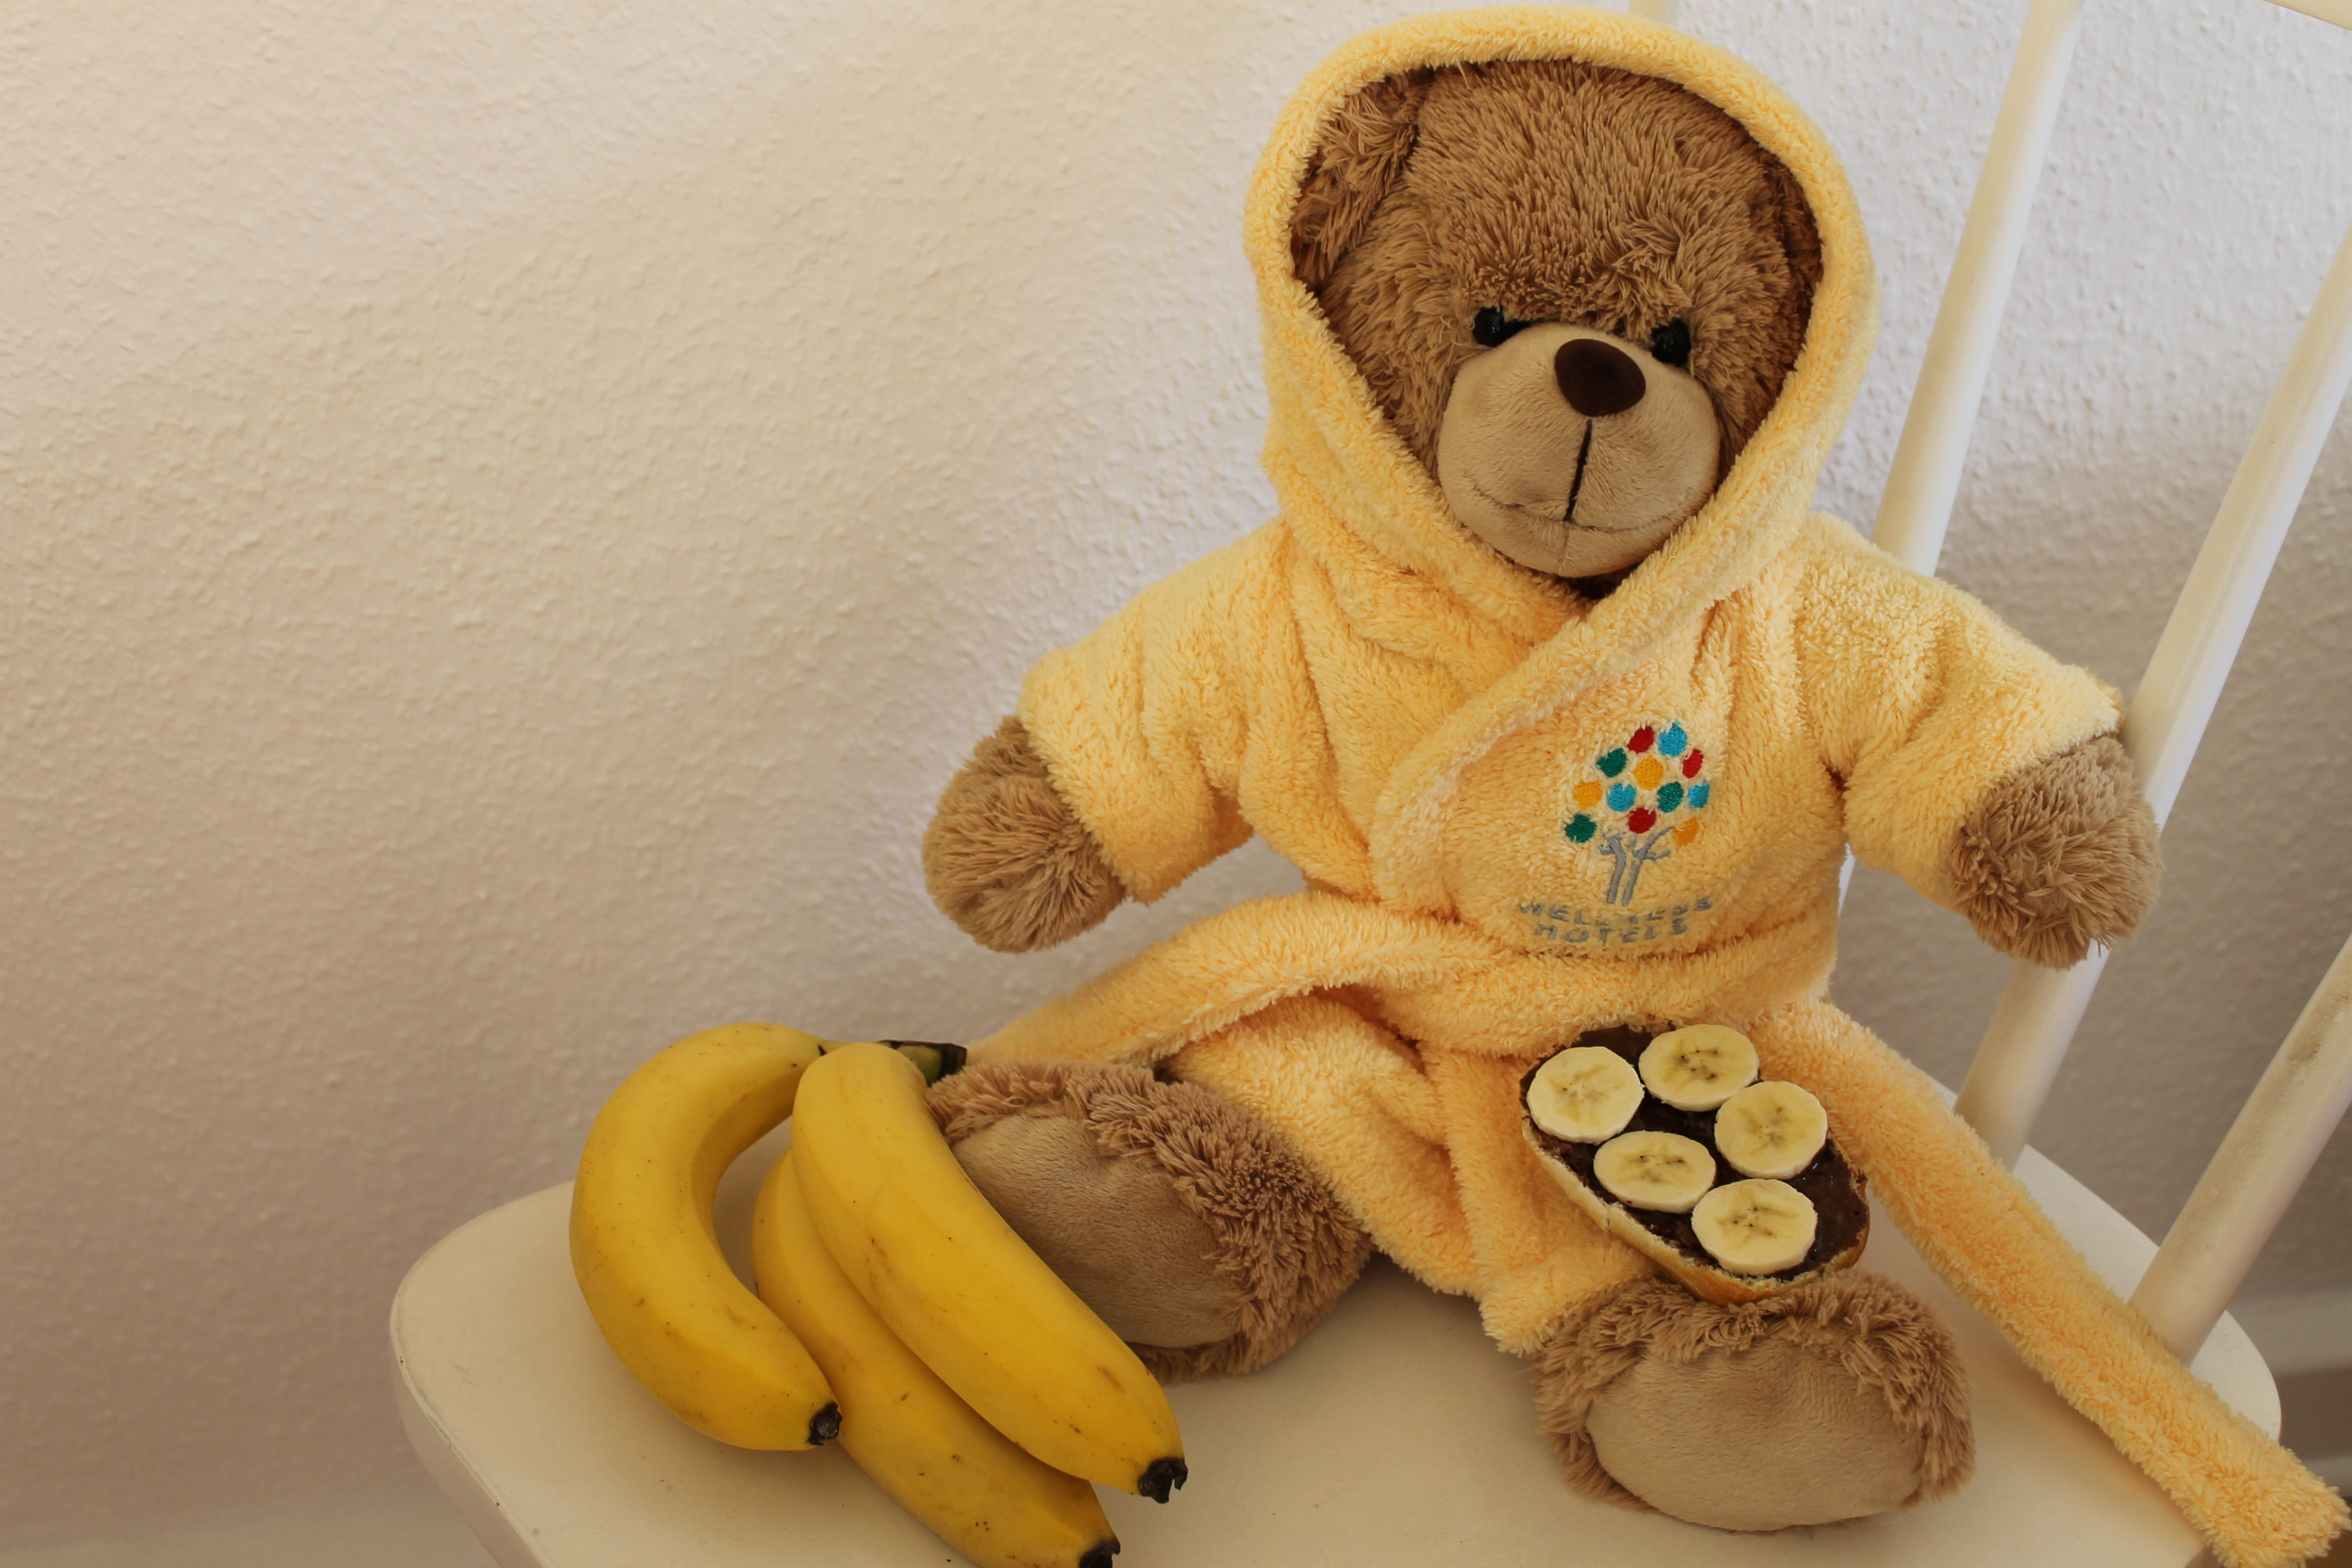 Sportler-Frühstück für den Wellness-Teddy